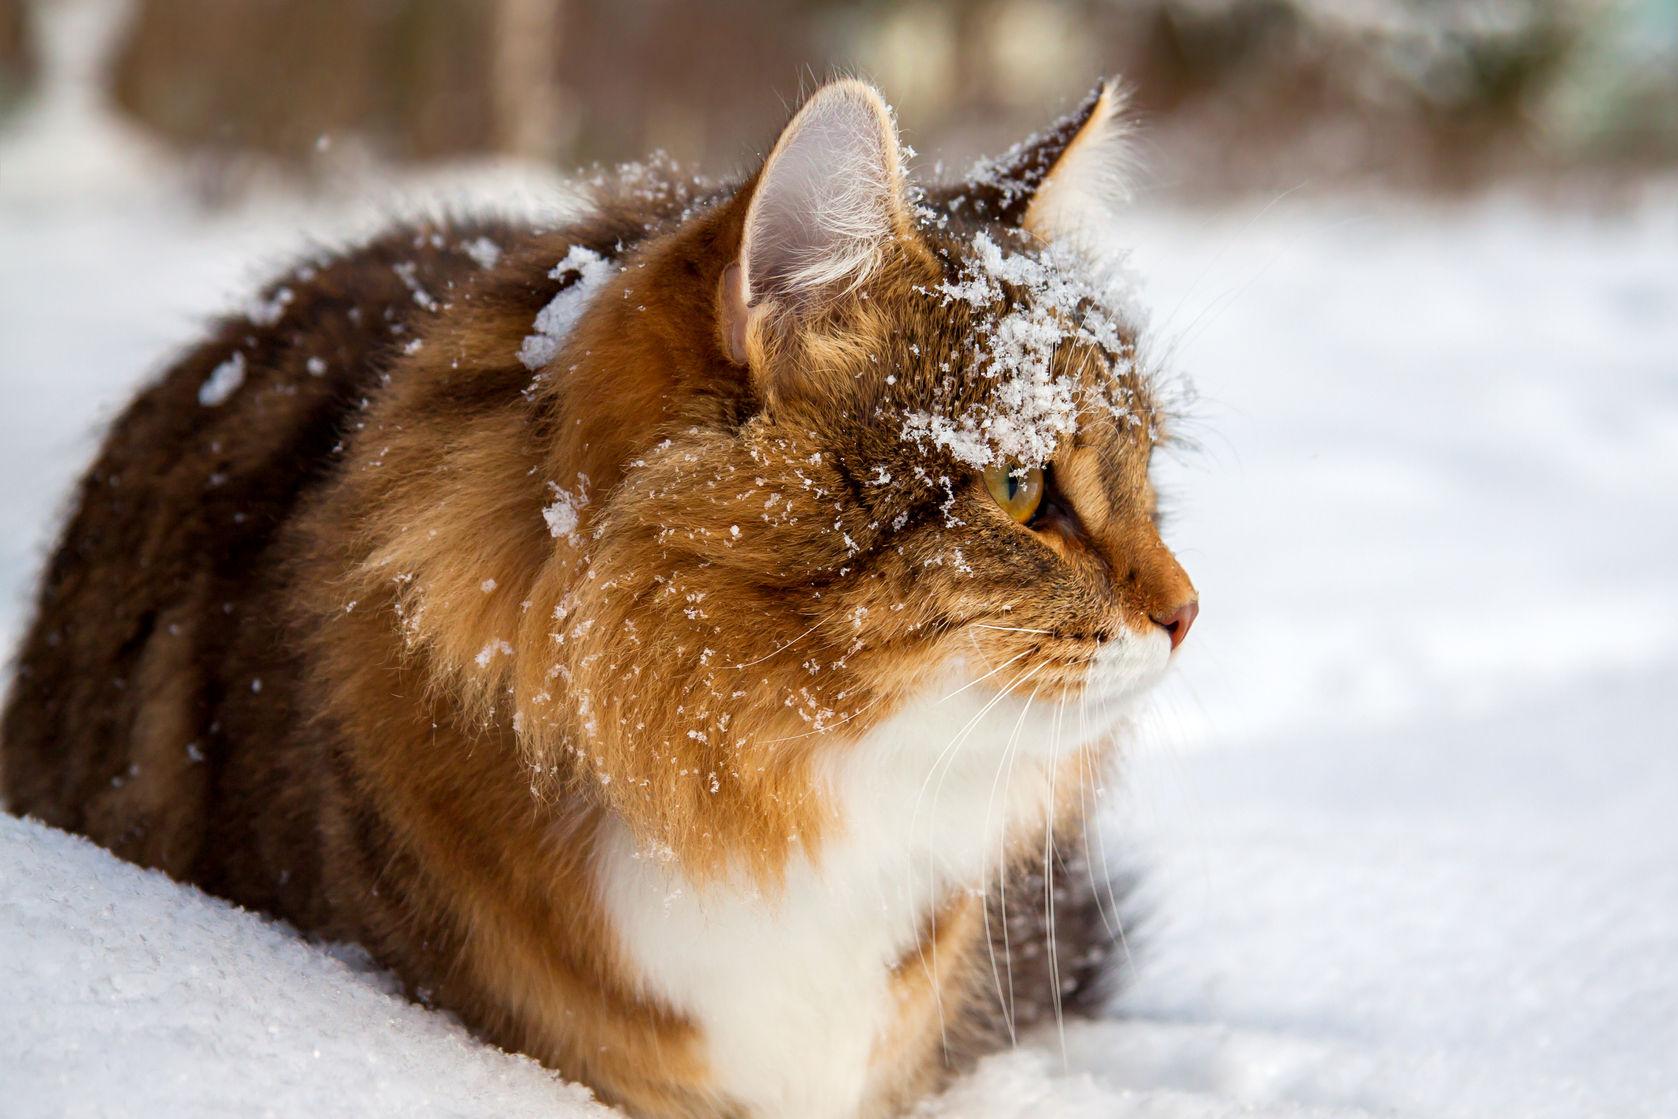 4ed48fe93a5e52 Domek dla kota - na zimę, na dwór, z kartonu. Jak zrobić ...